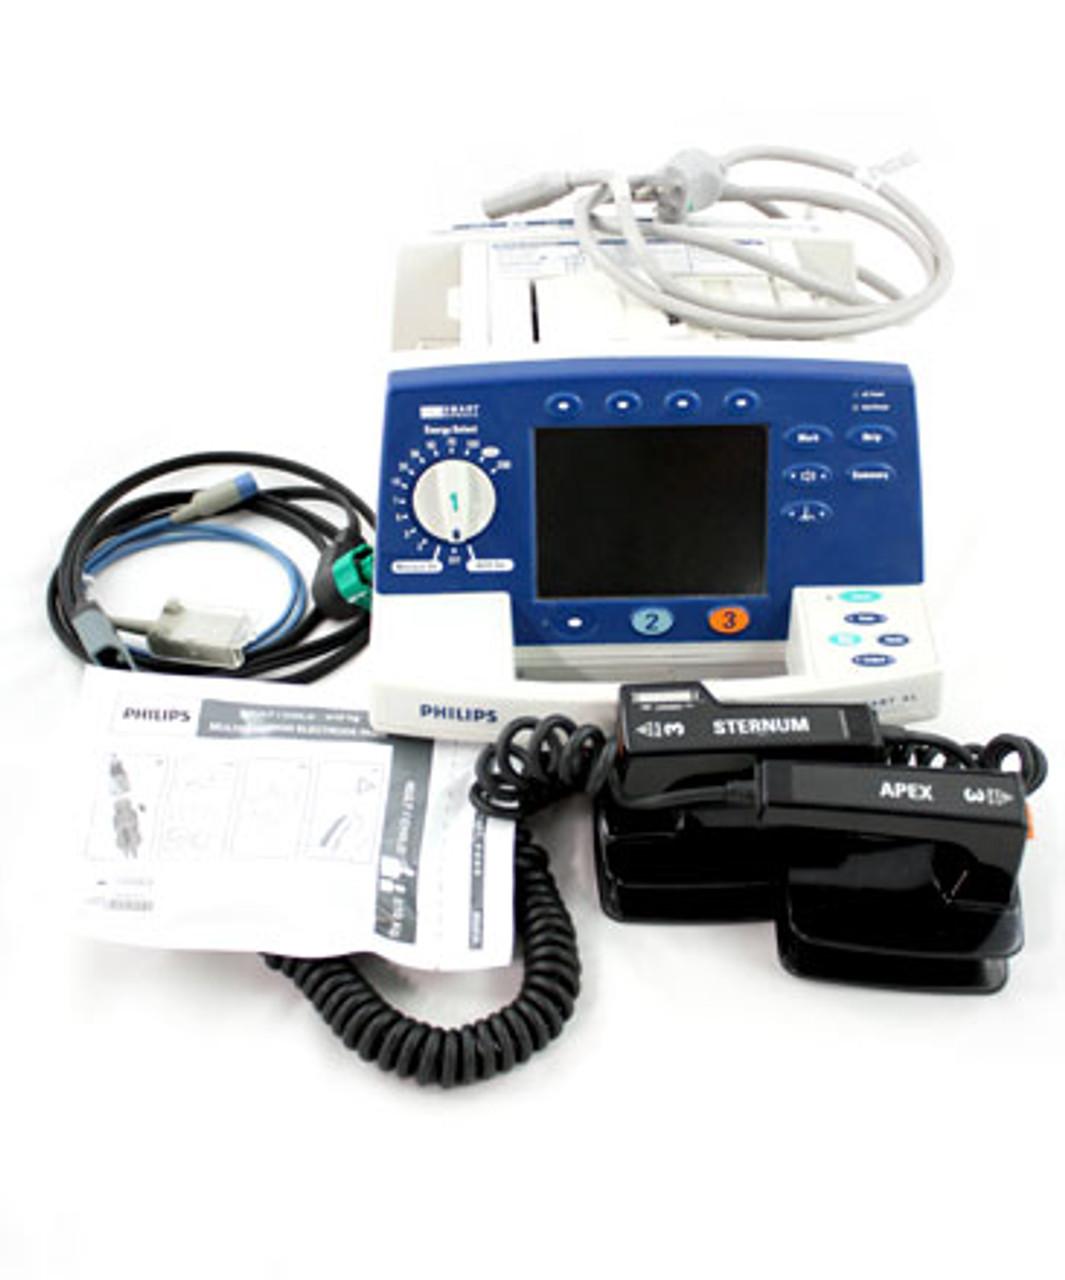 Refurbished Philips HeartStart XL Defibrillator/Monitor